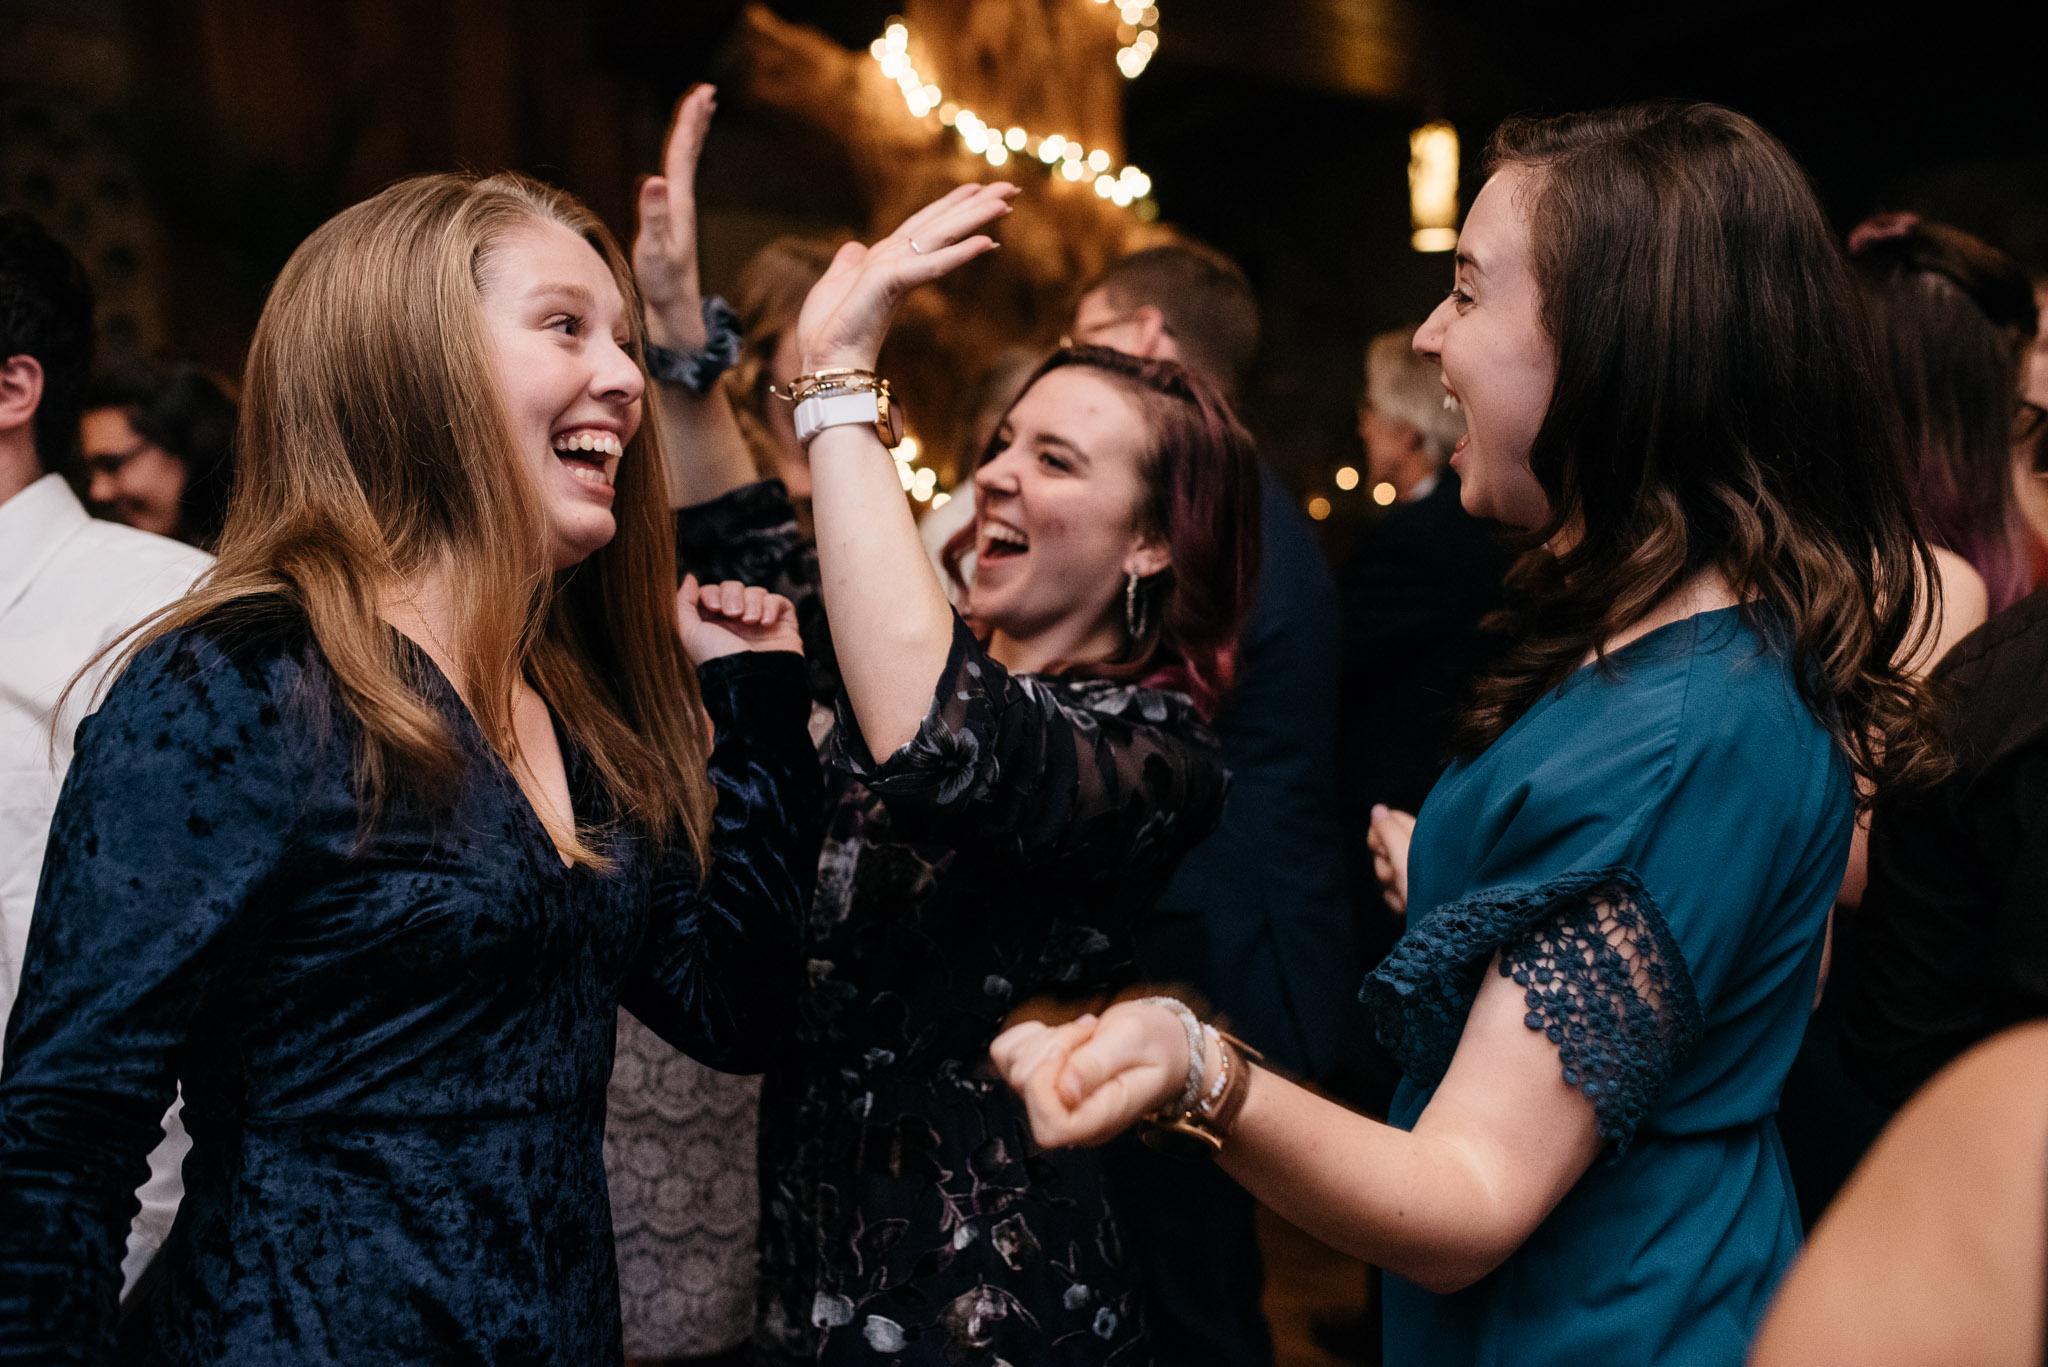 Green Gables Wedding reception, wedding photography, mariah fisher photography-7464.jpg